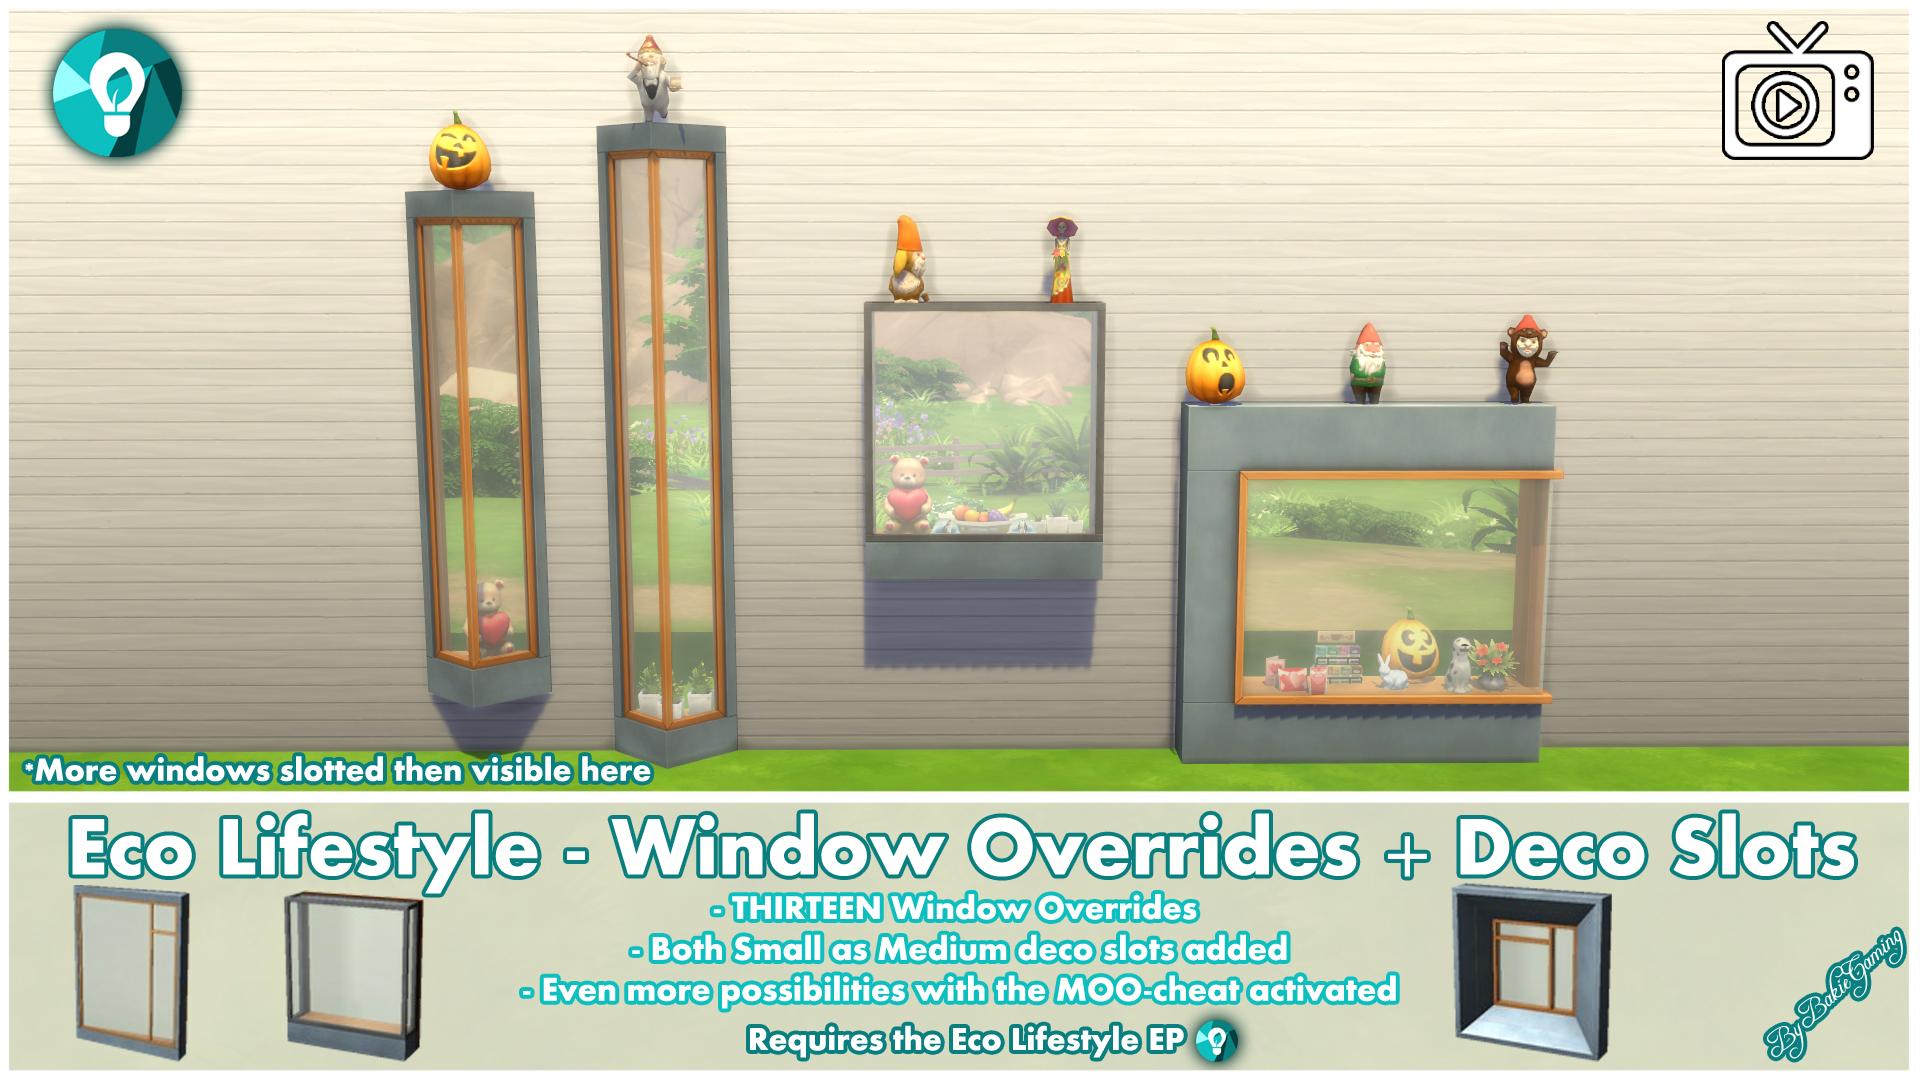 MTS_Bakie-1946642-BakieGaming-Thumbnail-EcoLifestyle-WindowOverrides-DecoSlots-Thumbnail.jpg